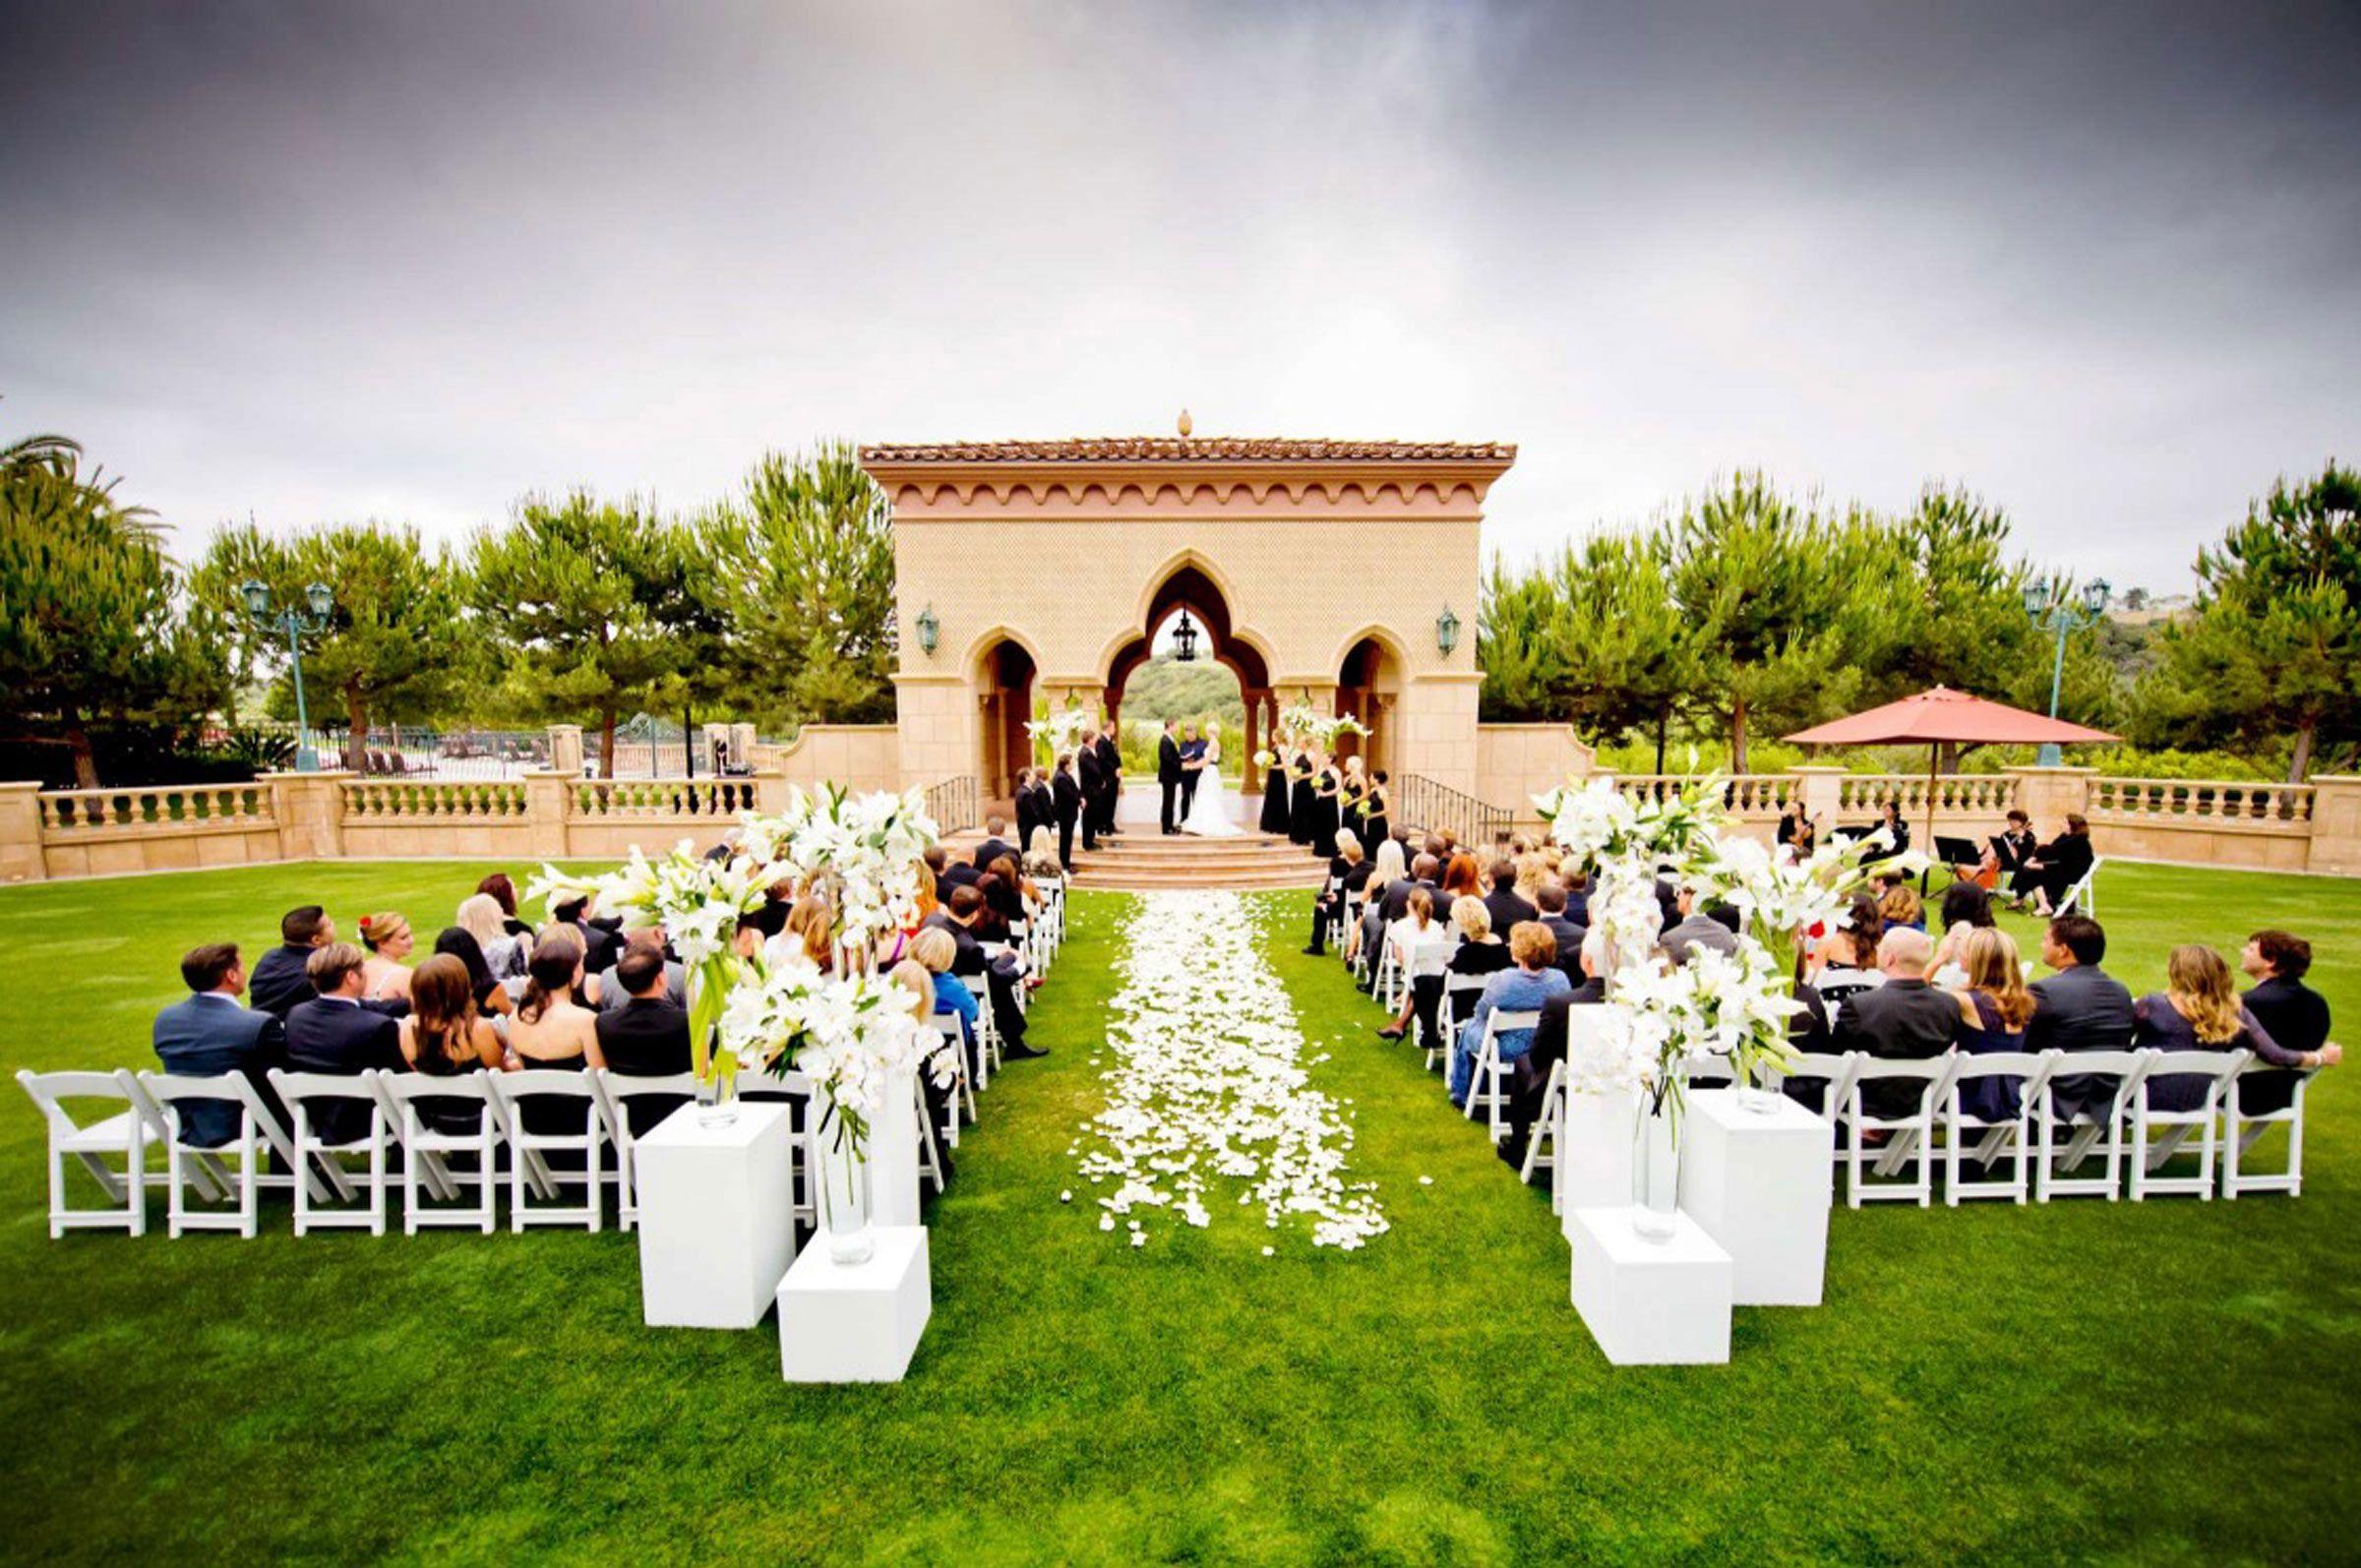 What A Beautiful And Captivating Wedding Venue Perfect Wedding Idea Wedding Venue Costs San Diego Wedding Venues Cheap Wedding Venues